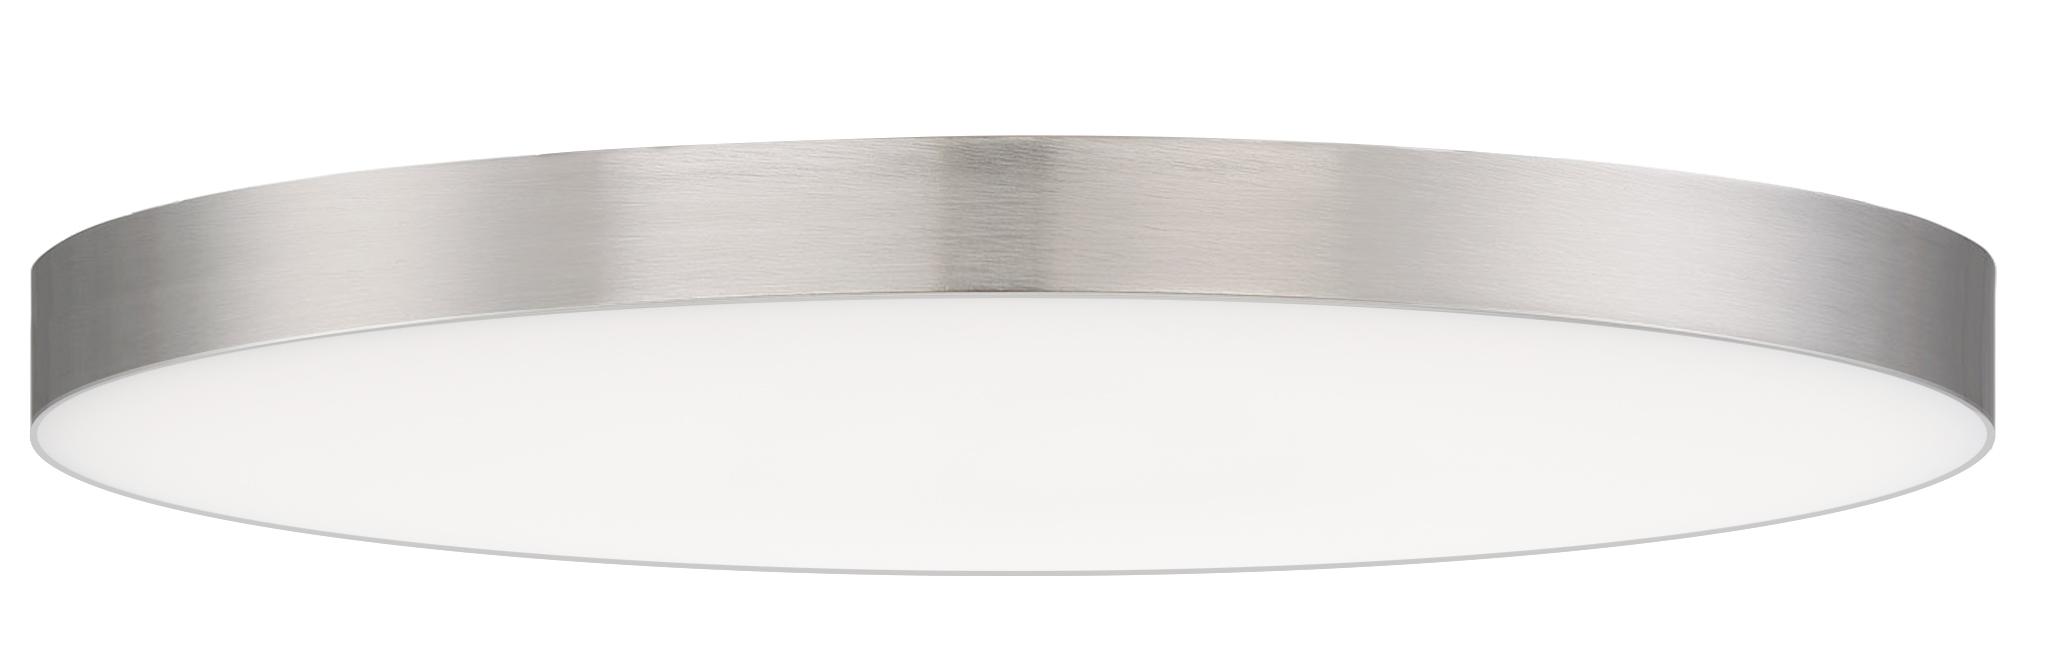 Trim 16-inch Round LED Flush Mount 3000K | Maxim Lighting